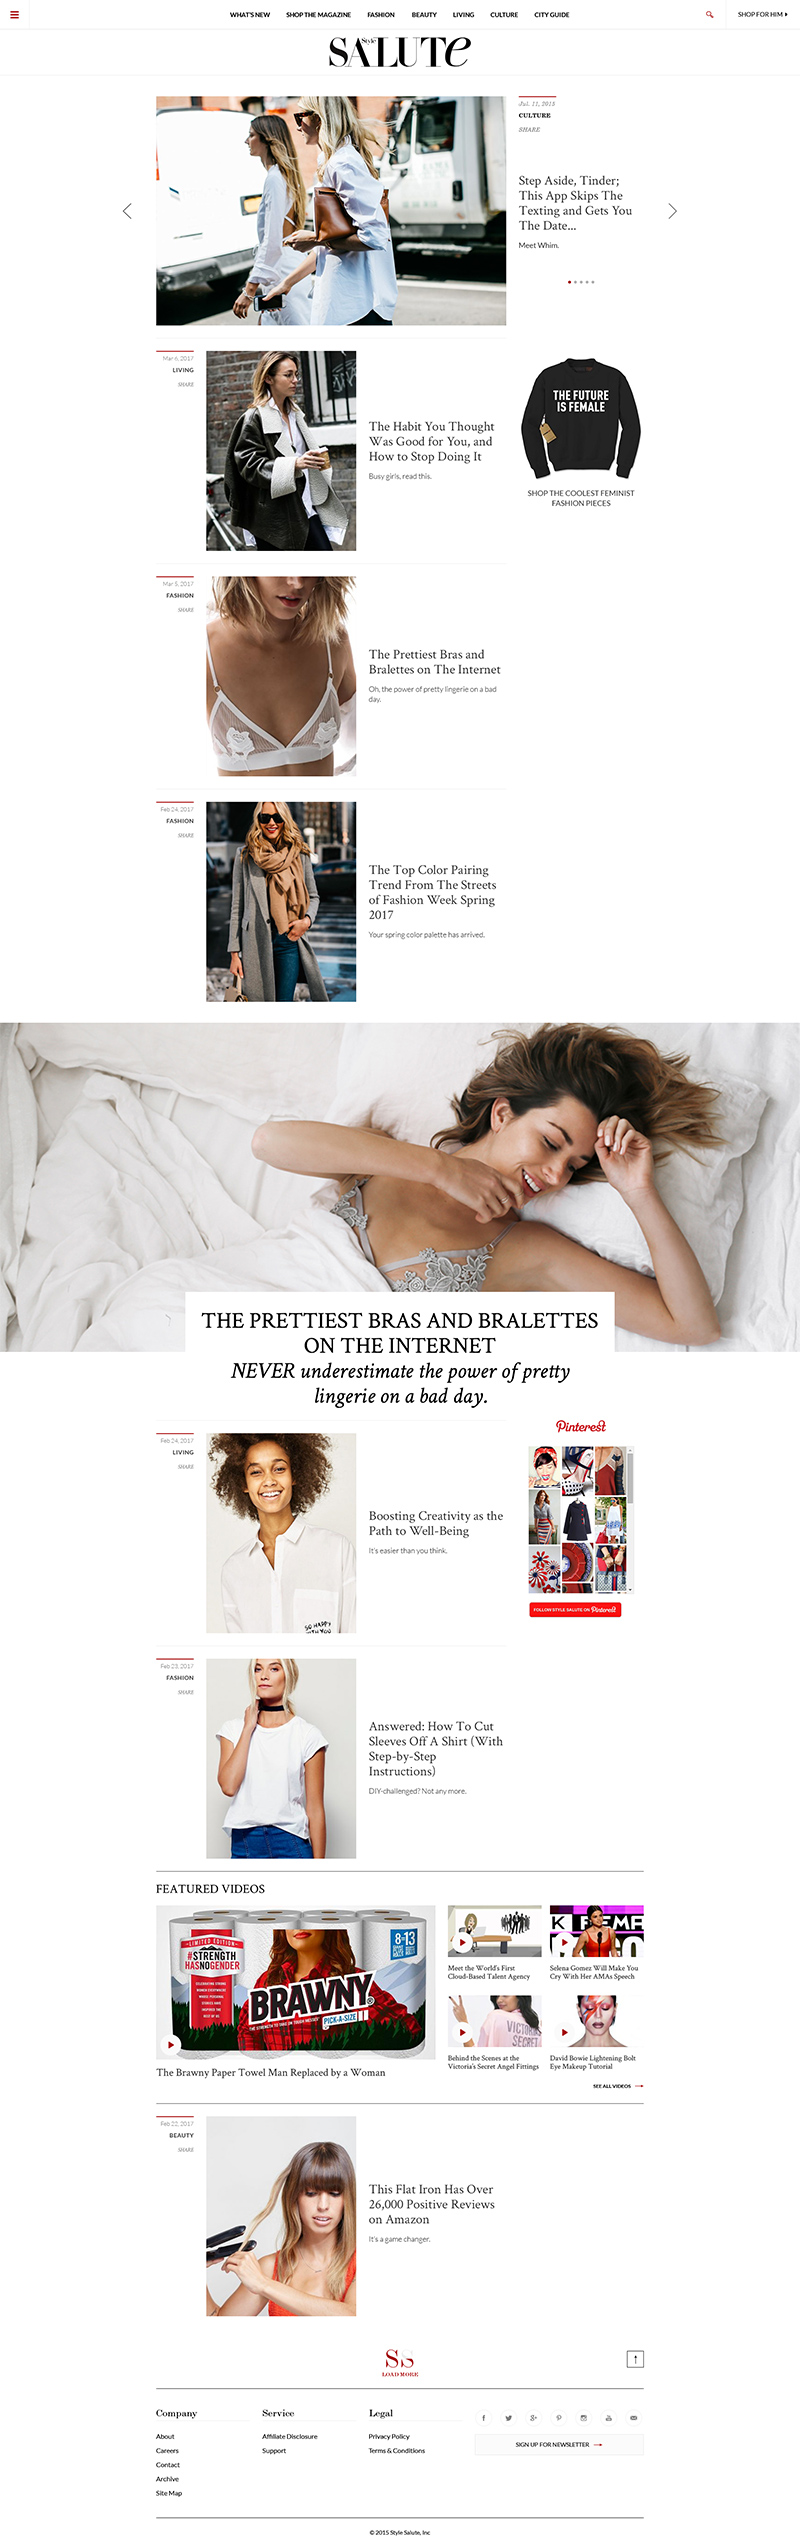 Style Salute Web Design